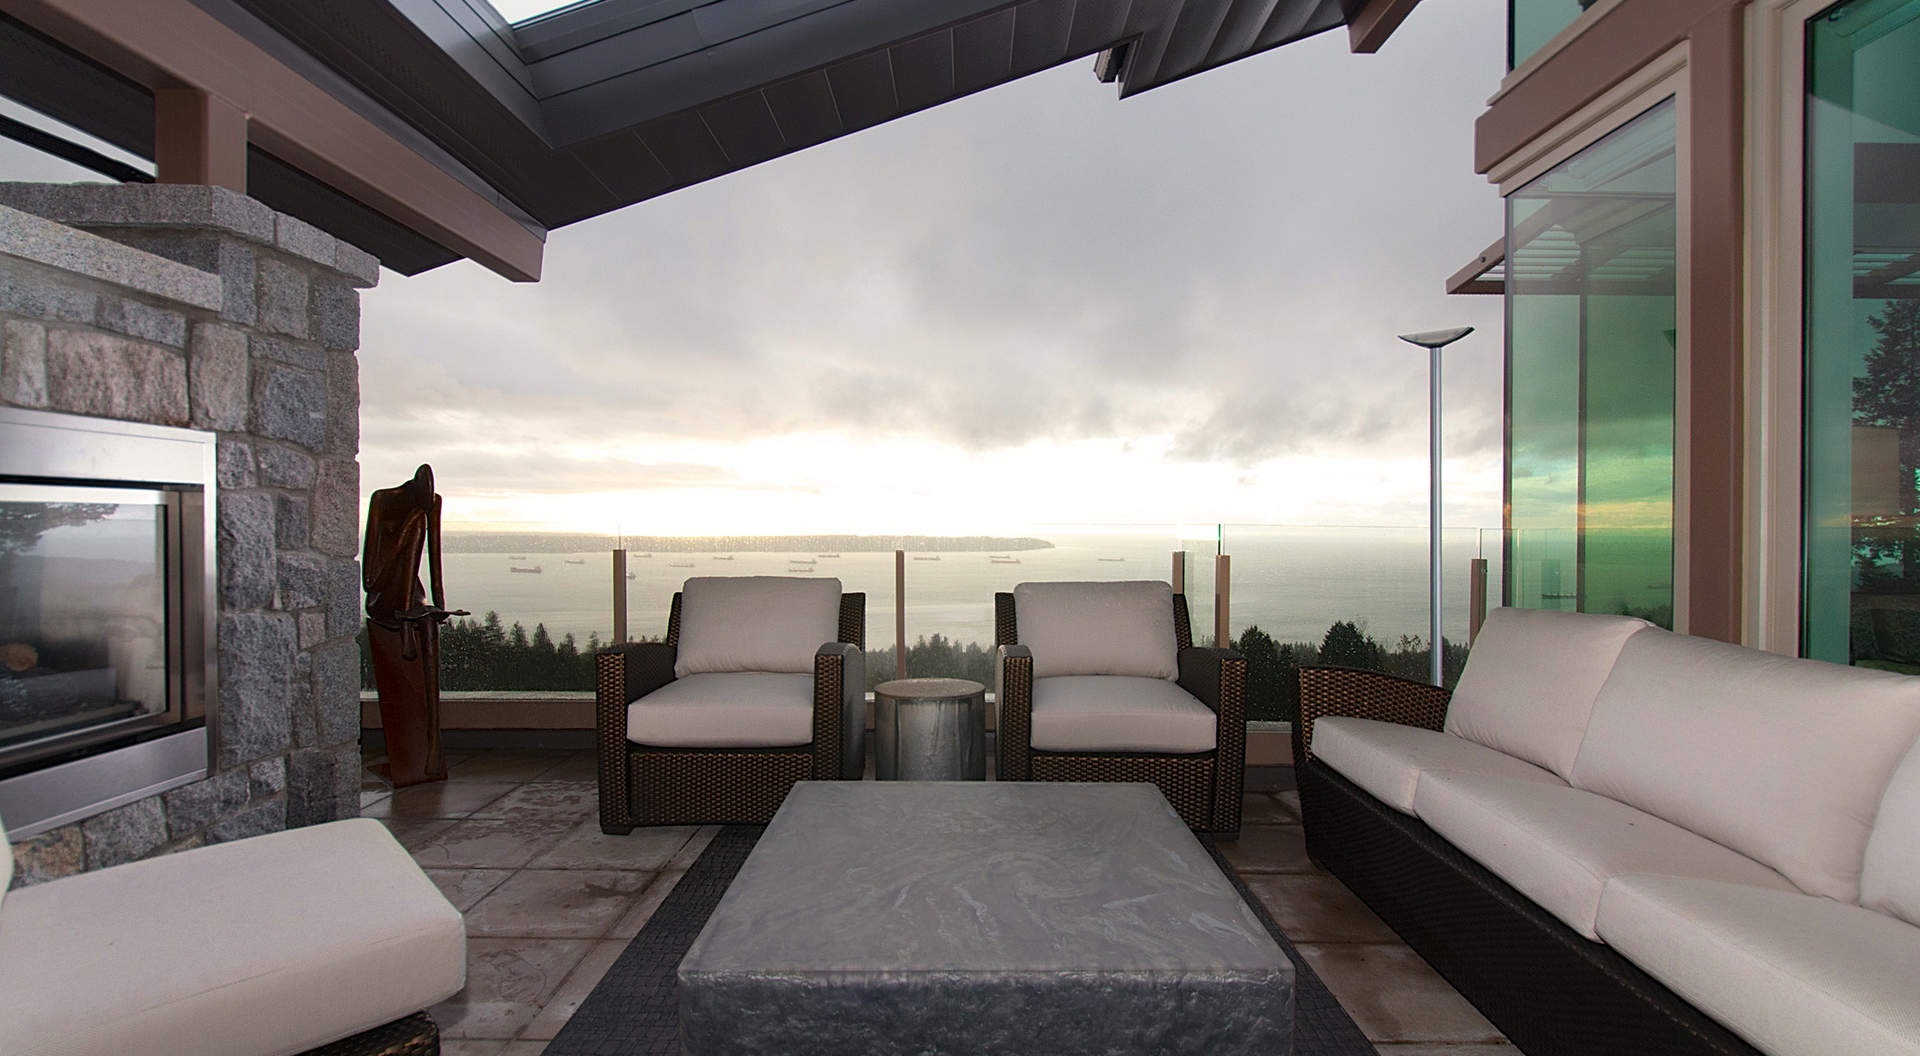 penthouse terrace lakeview | Interior Design Ideas.